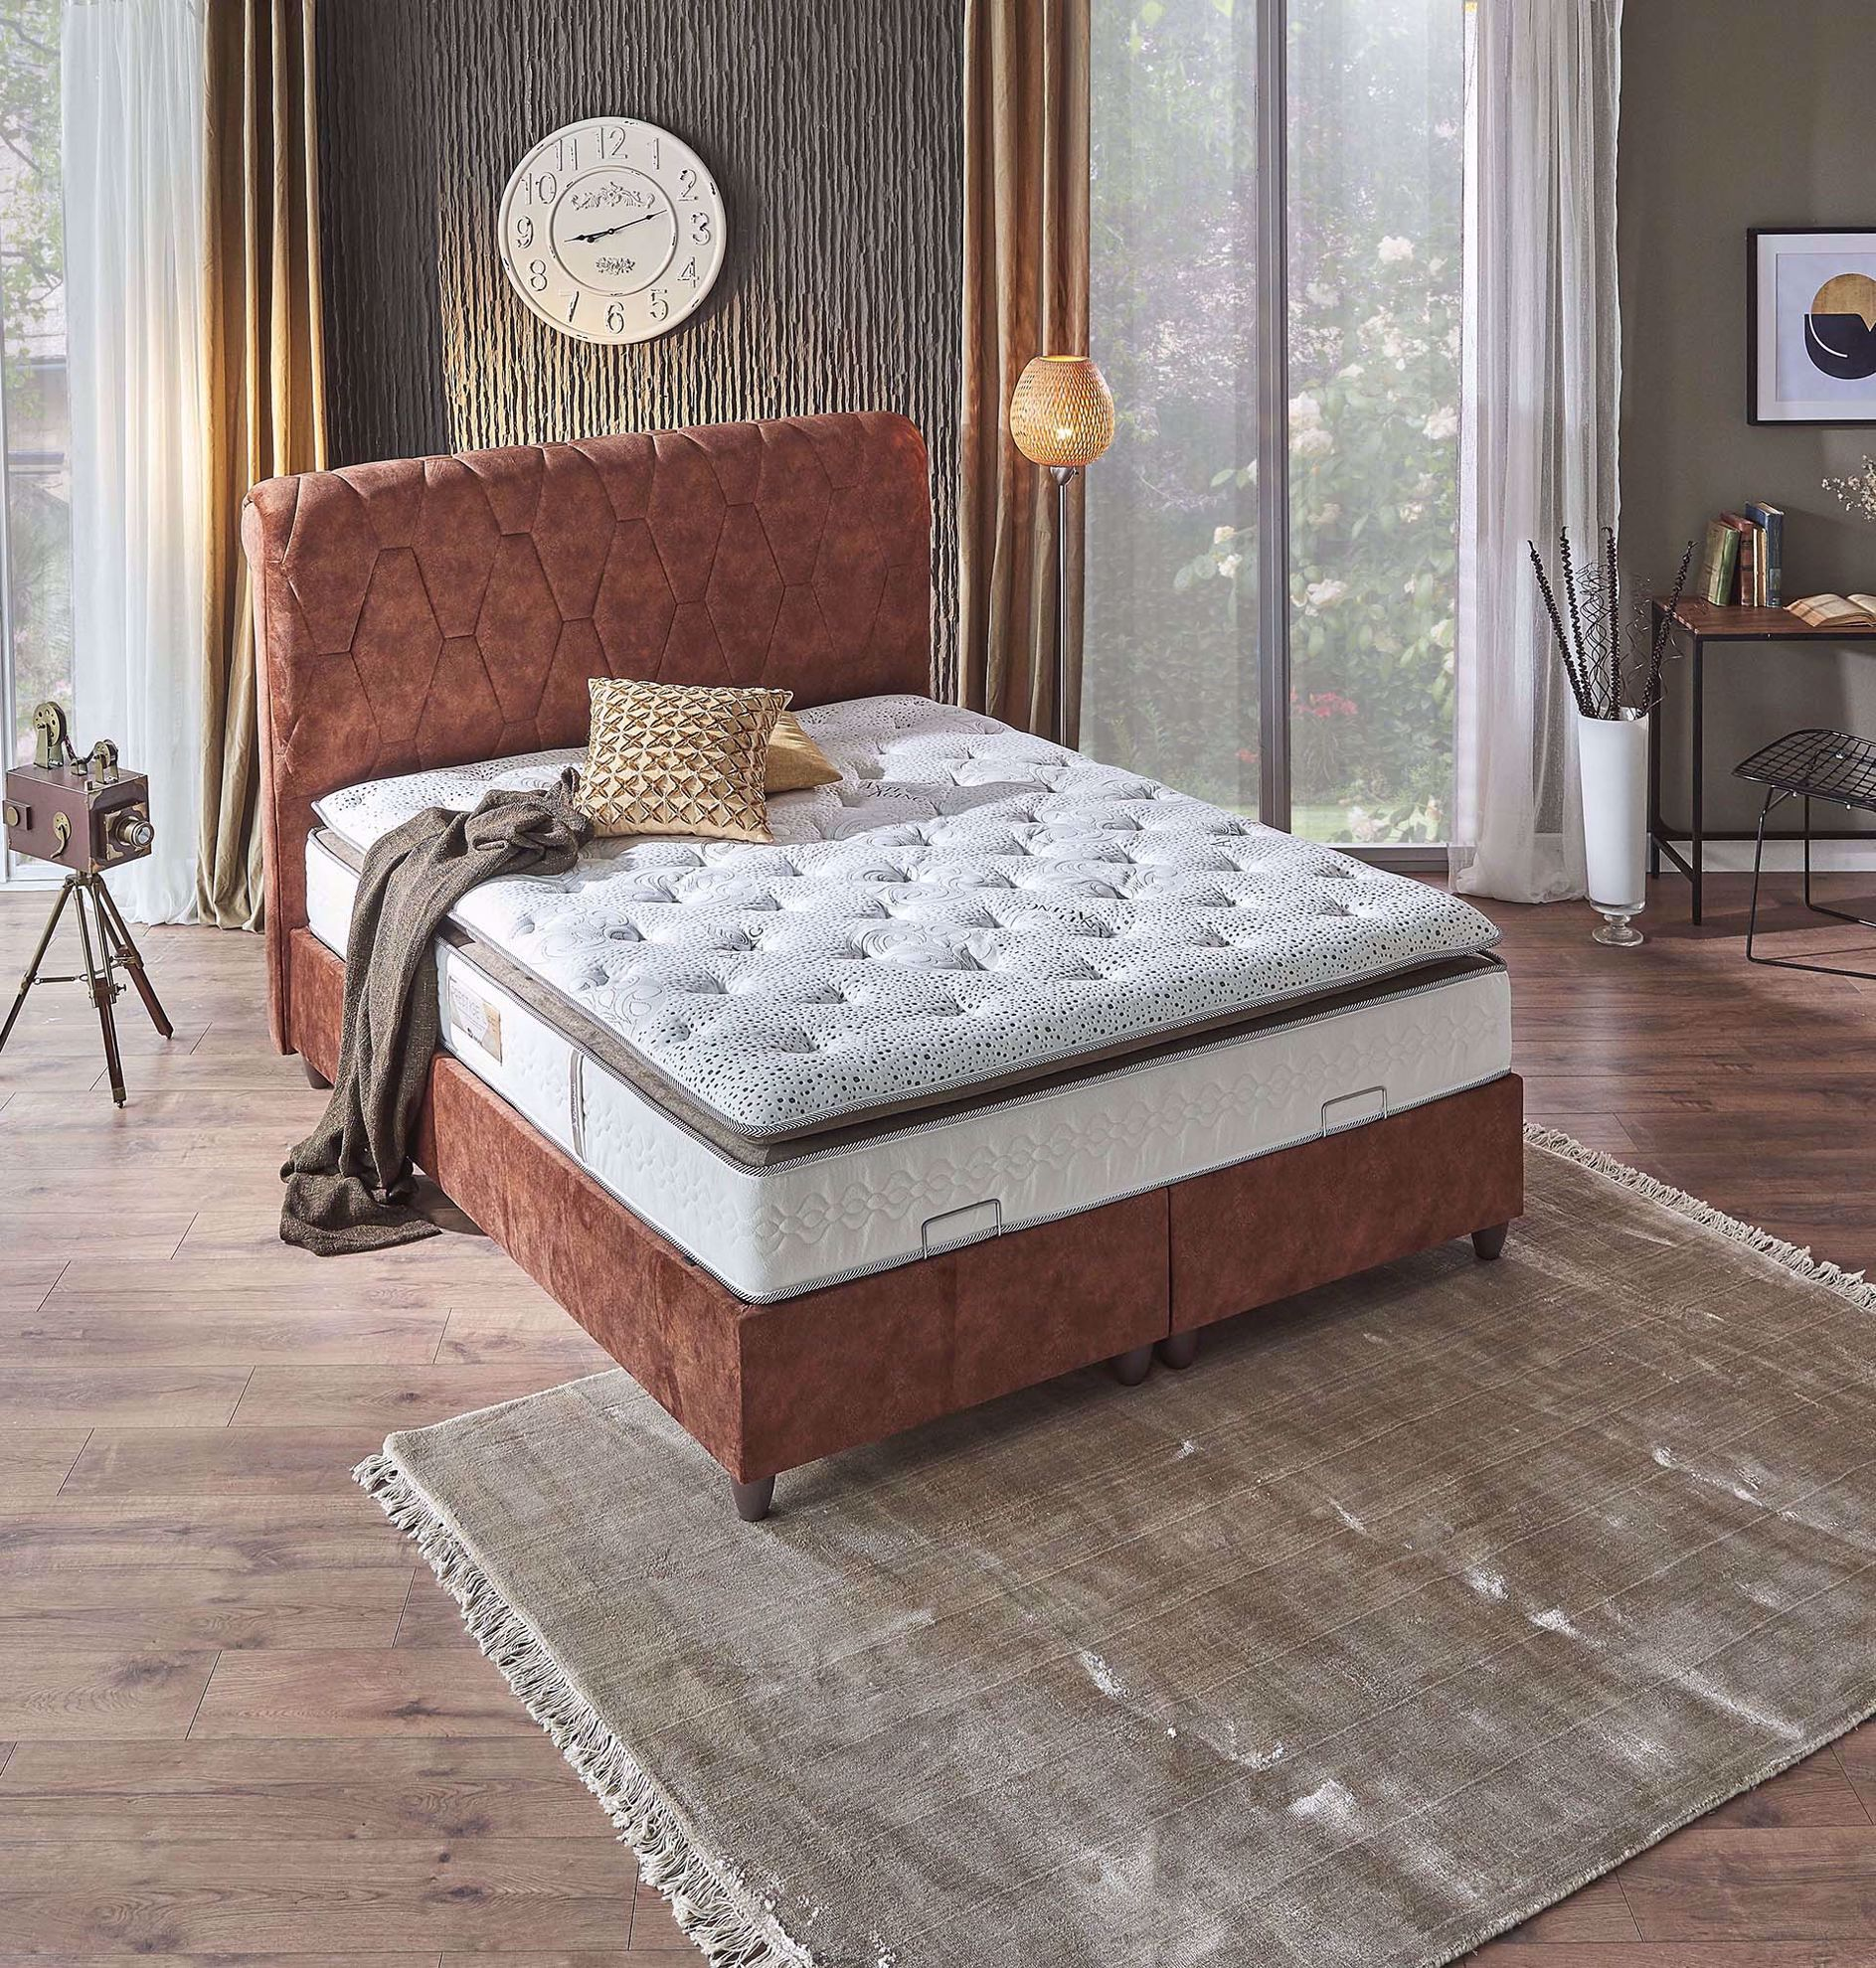 Comfort Plus Prestige Life Yatak 100*200 cm